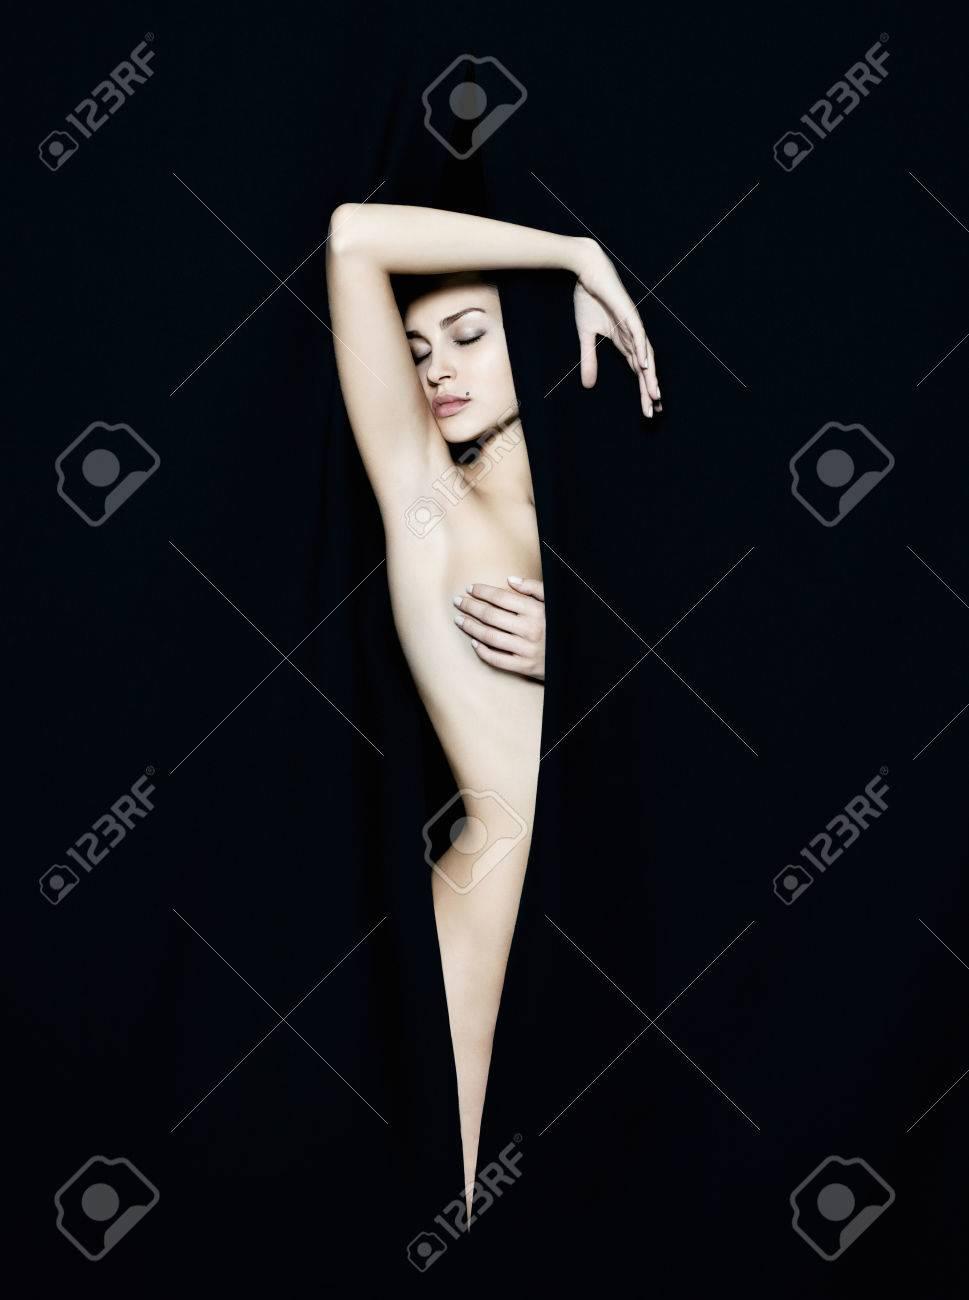 Woman sucking cocks